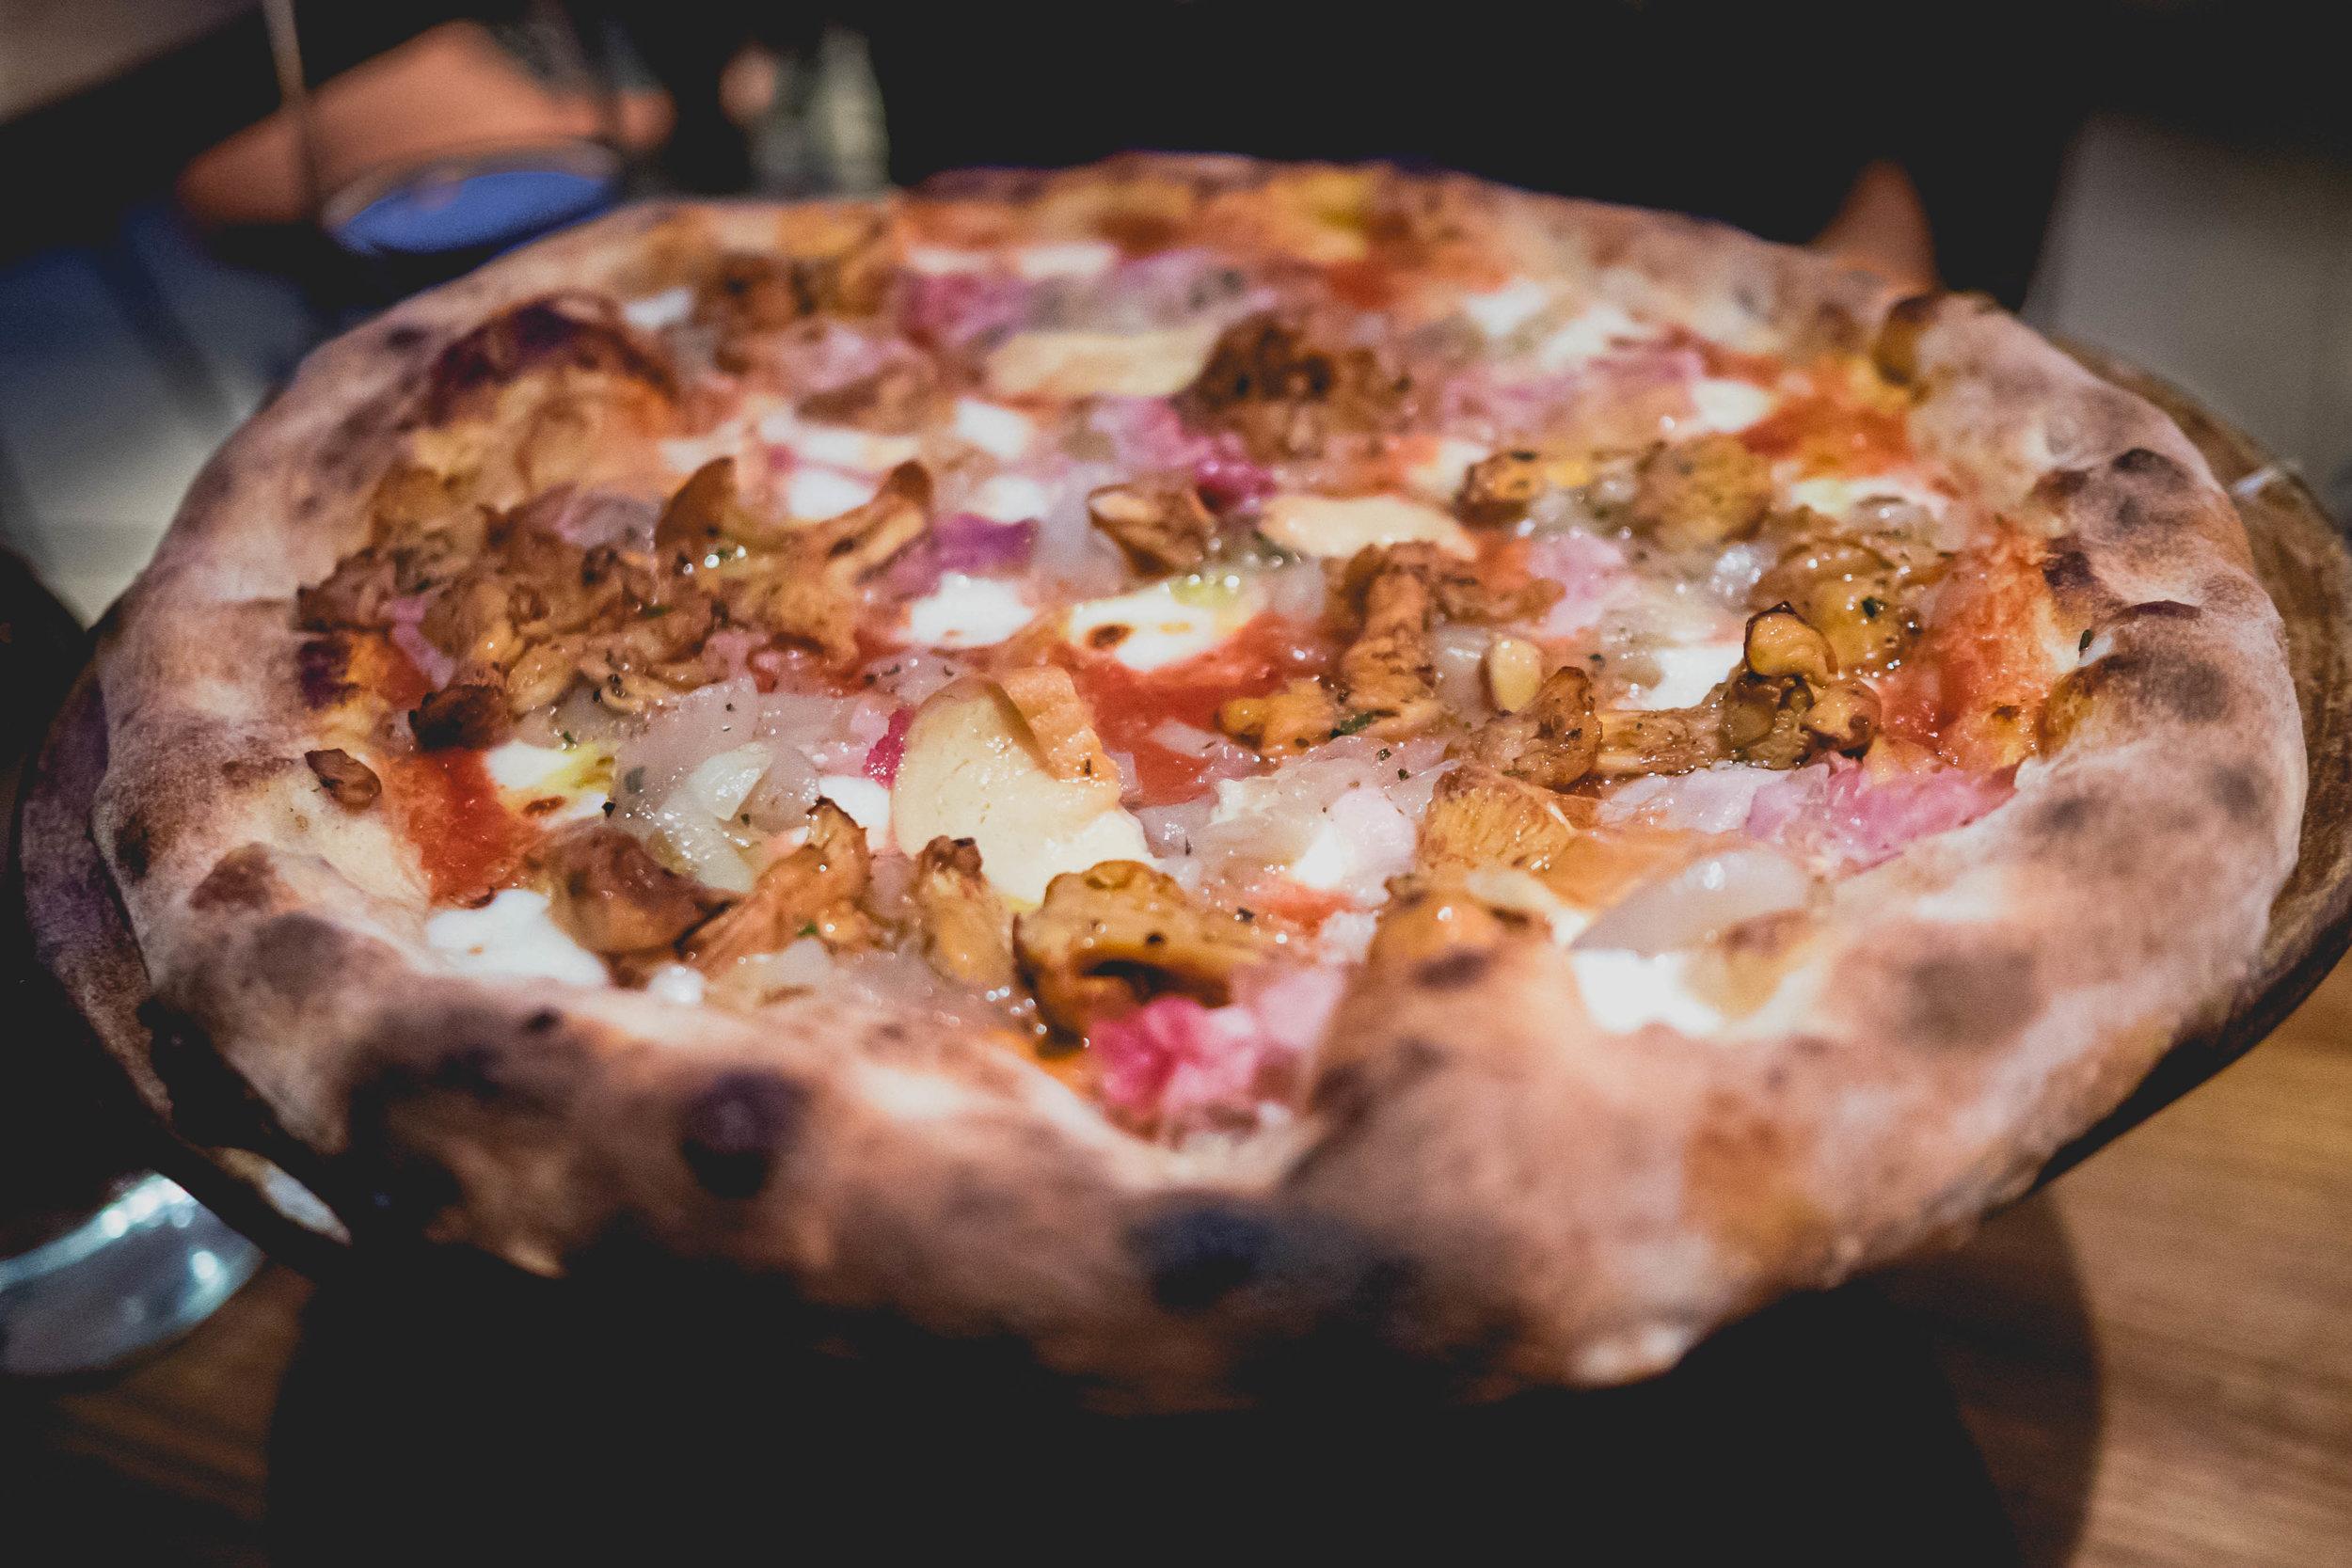 chanterelle mushrooms  pizza with tomatoes, house made mozzarella, prosciutto cotto, smoked buffalo, provola, shallots.